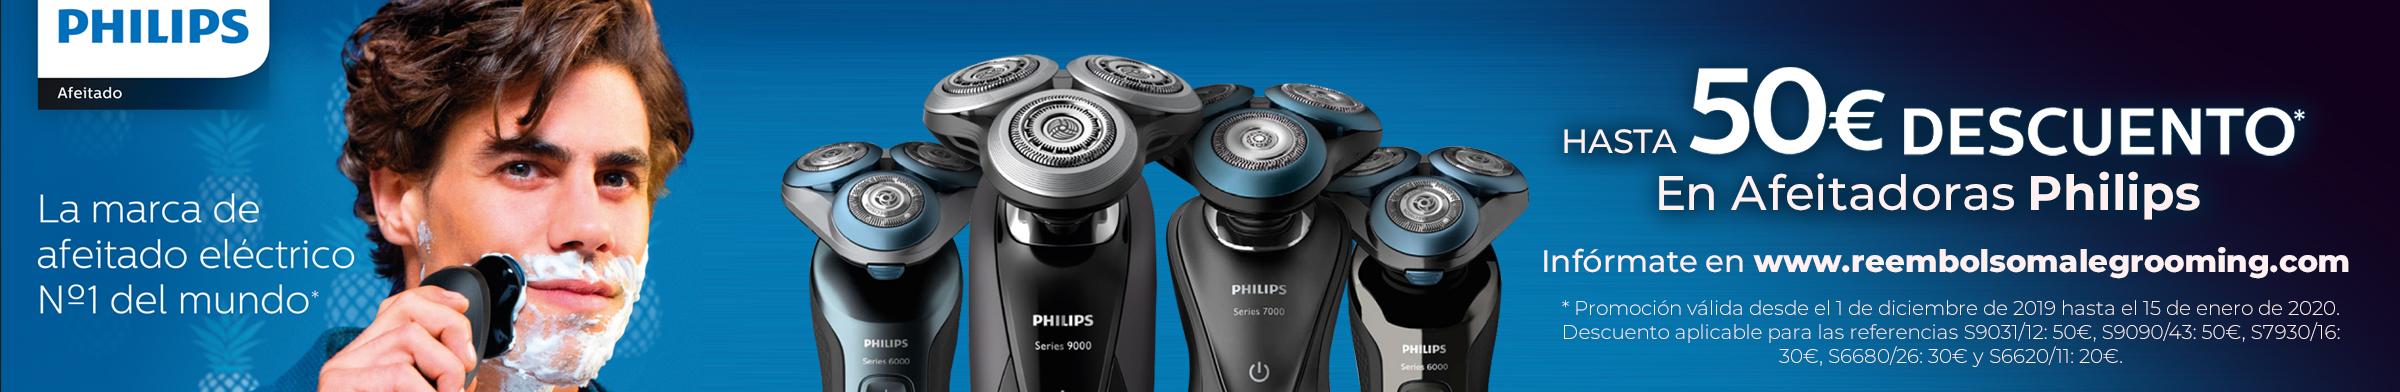 Hasta 50€ de descuento en Afeitadoras Philips